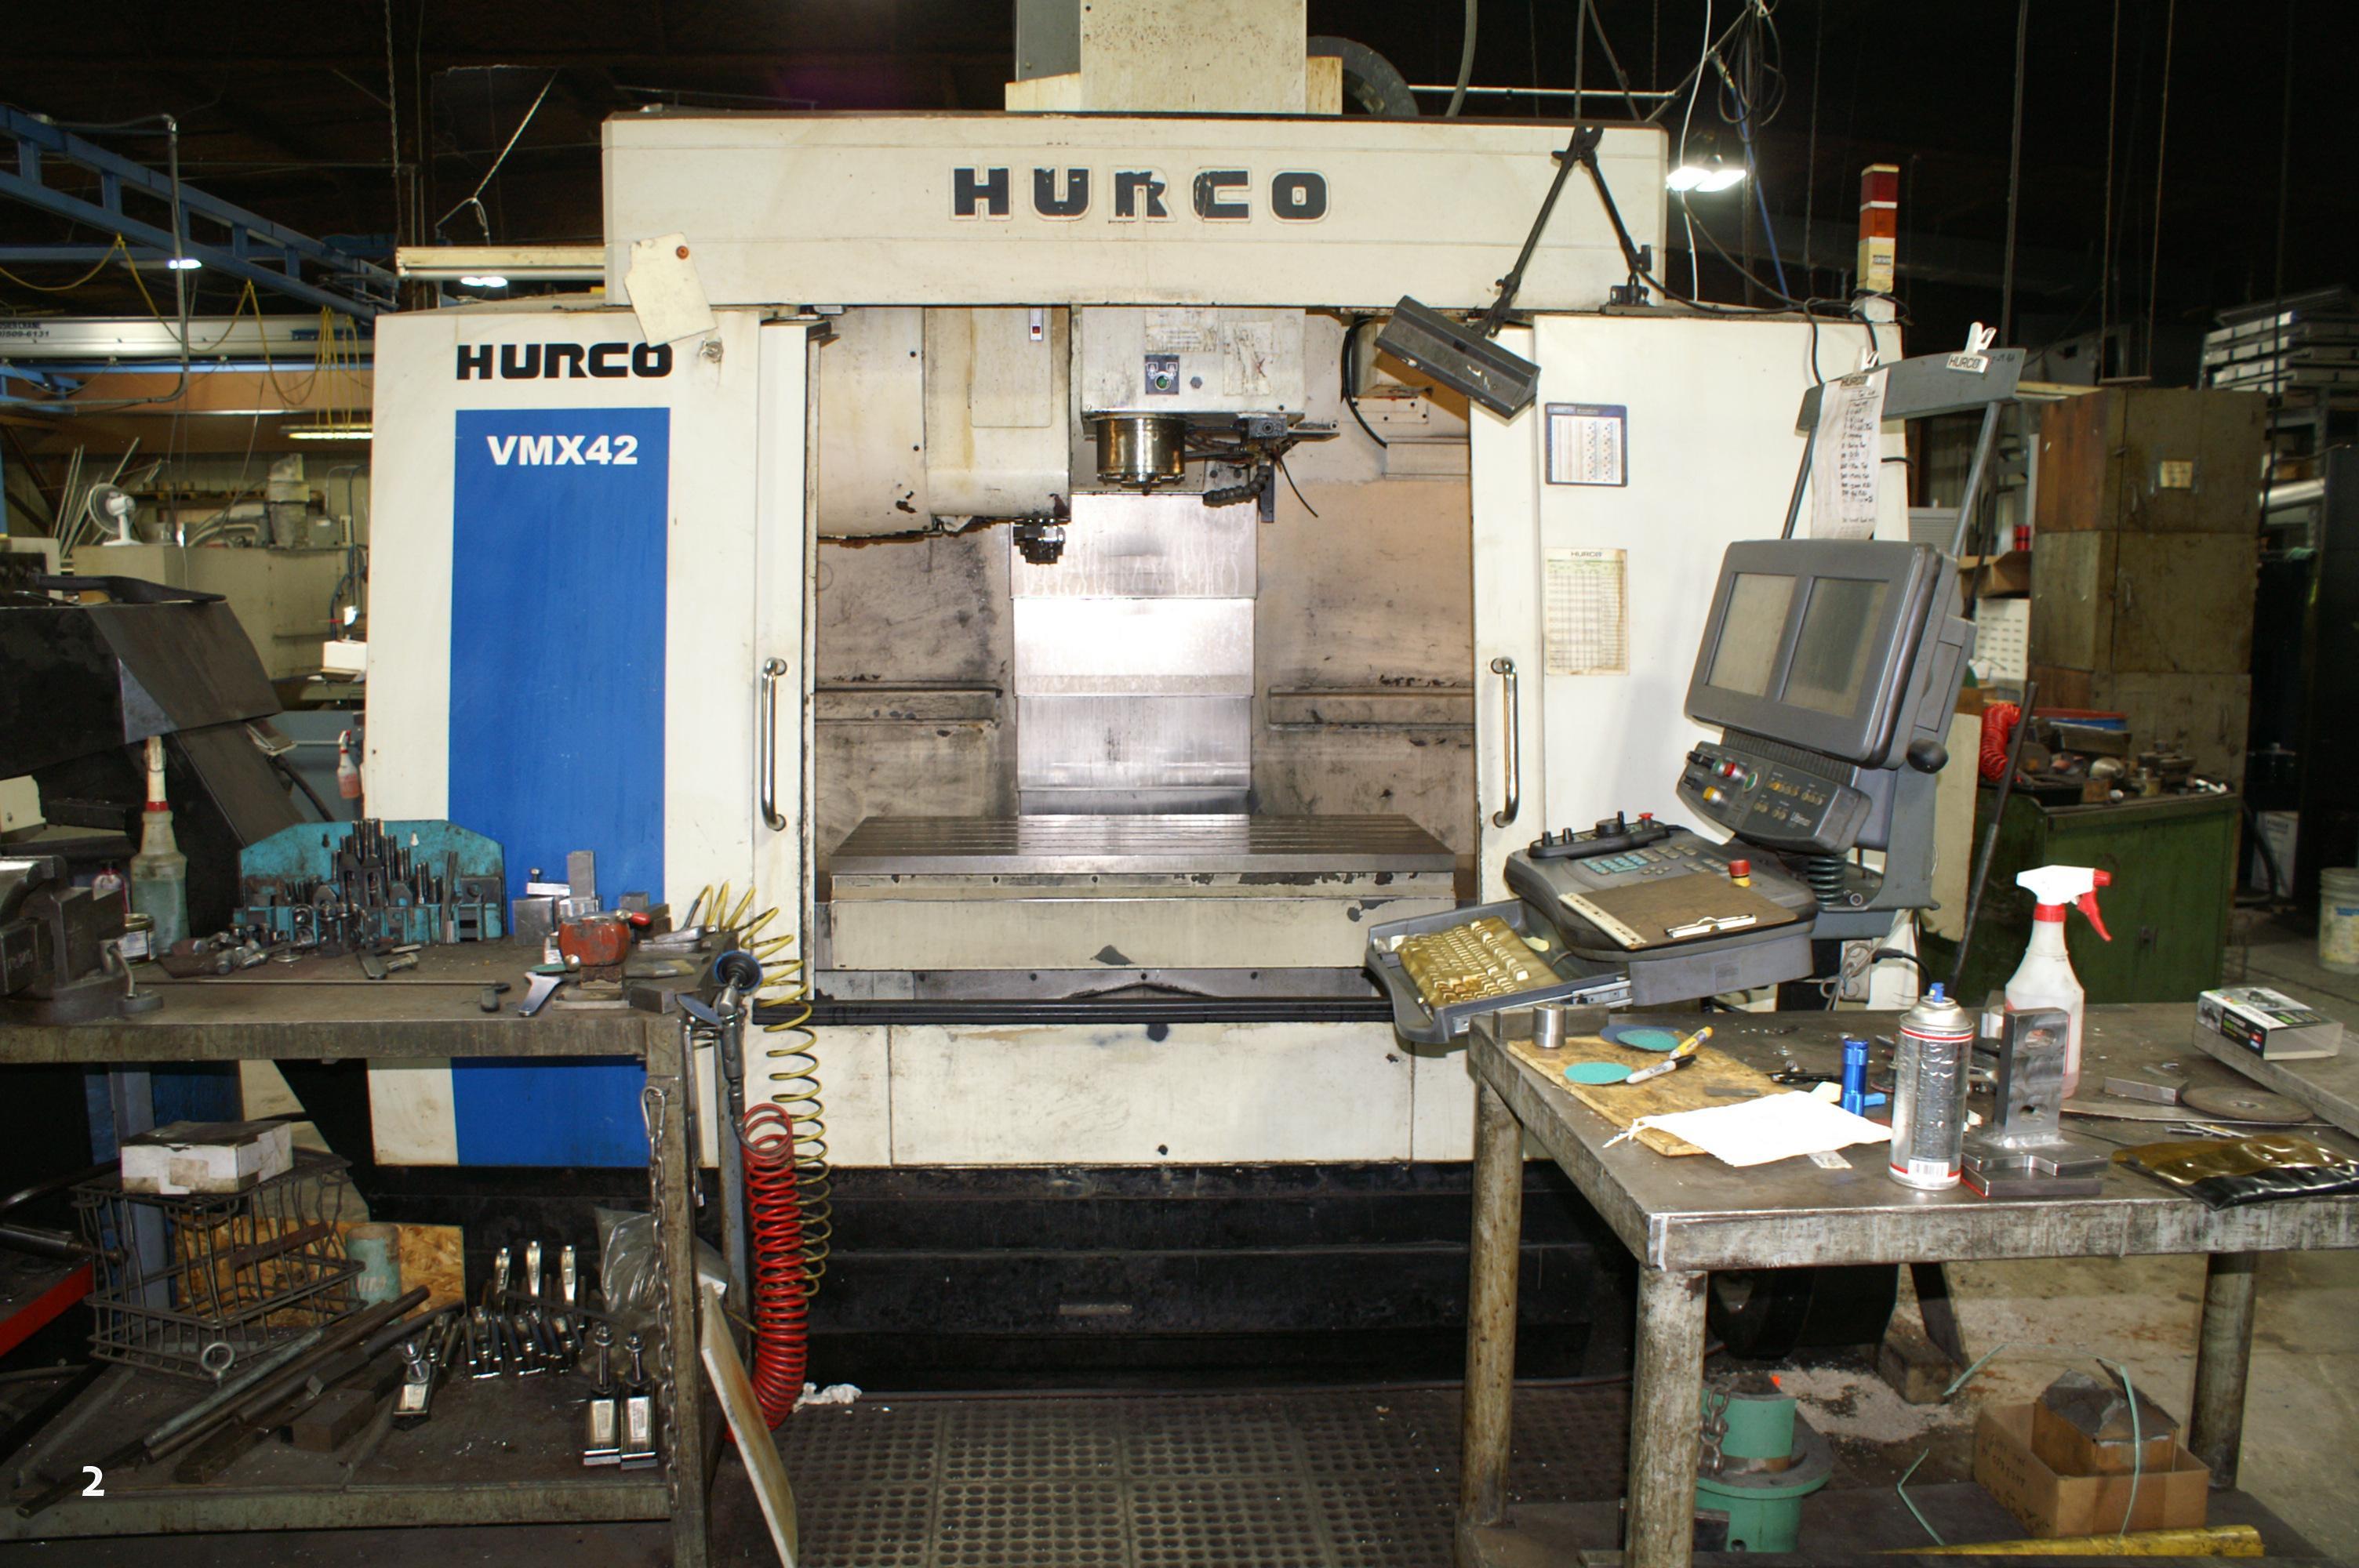 2008 HURCO VMX-42 VERTICAL MACHINING CENTER